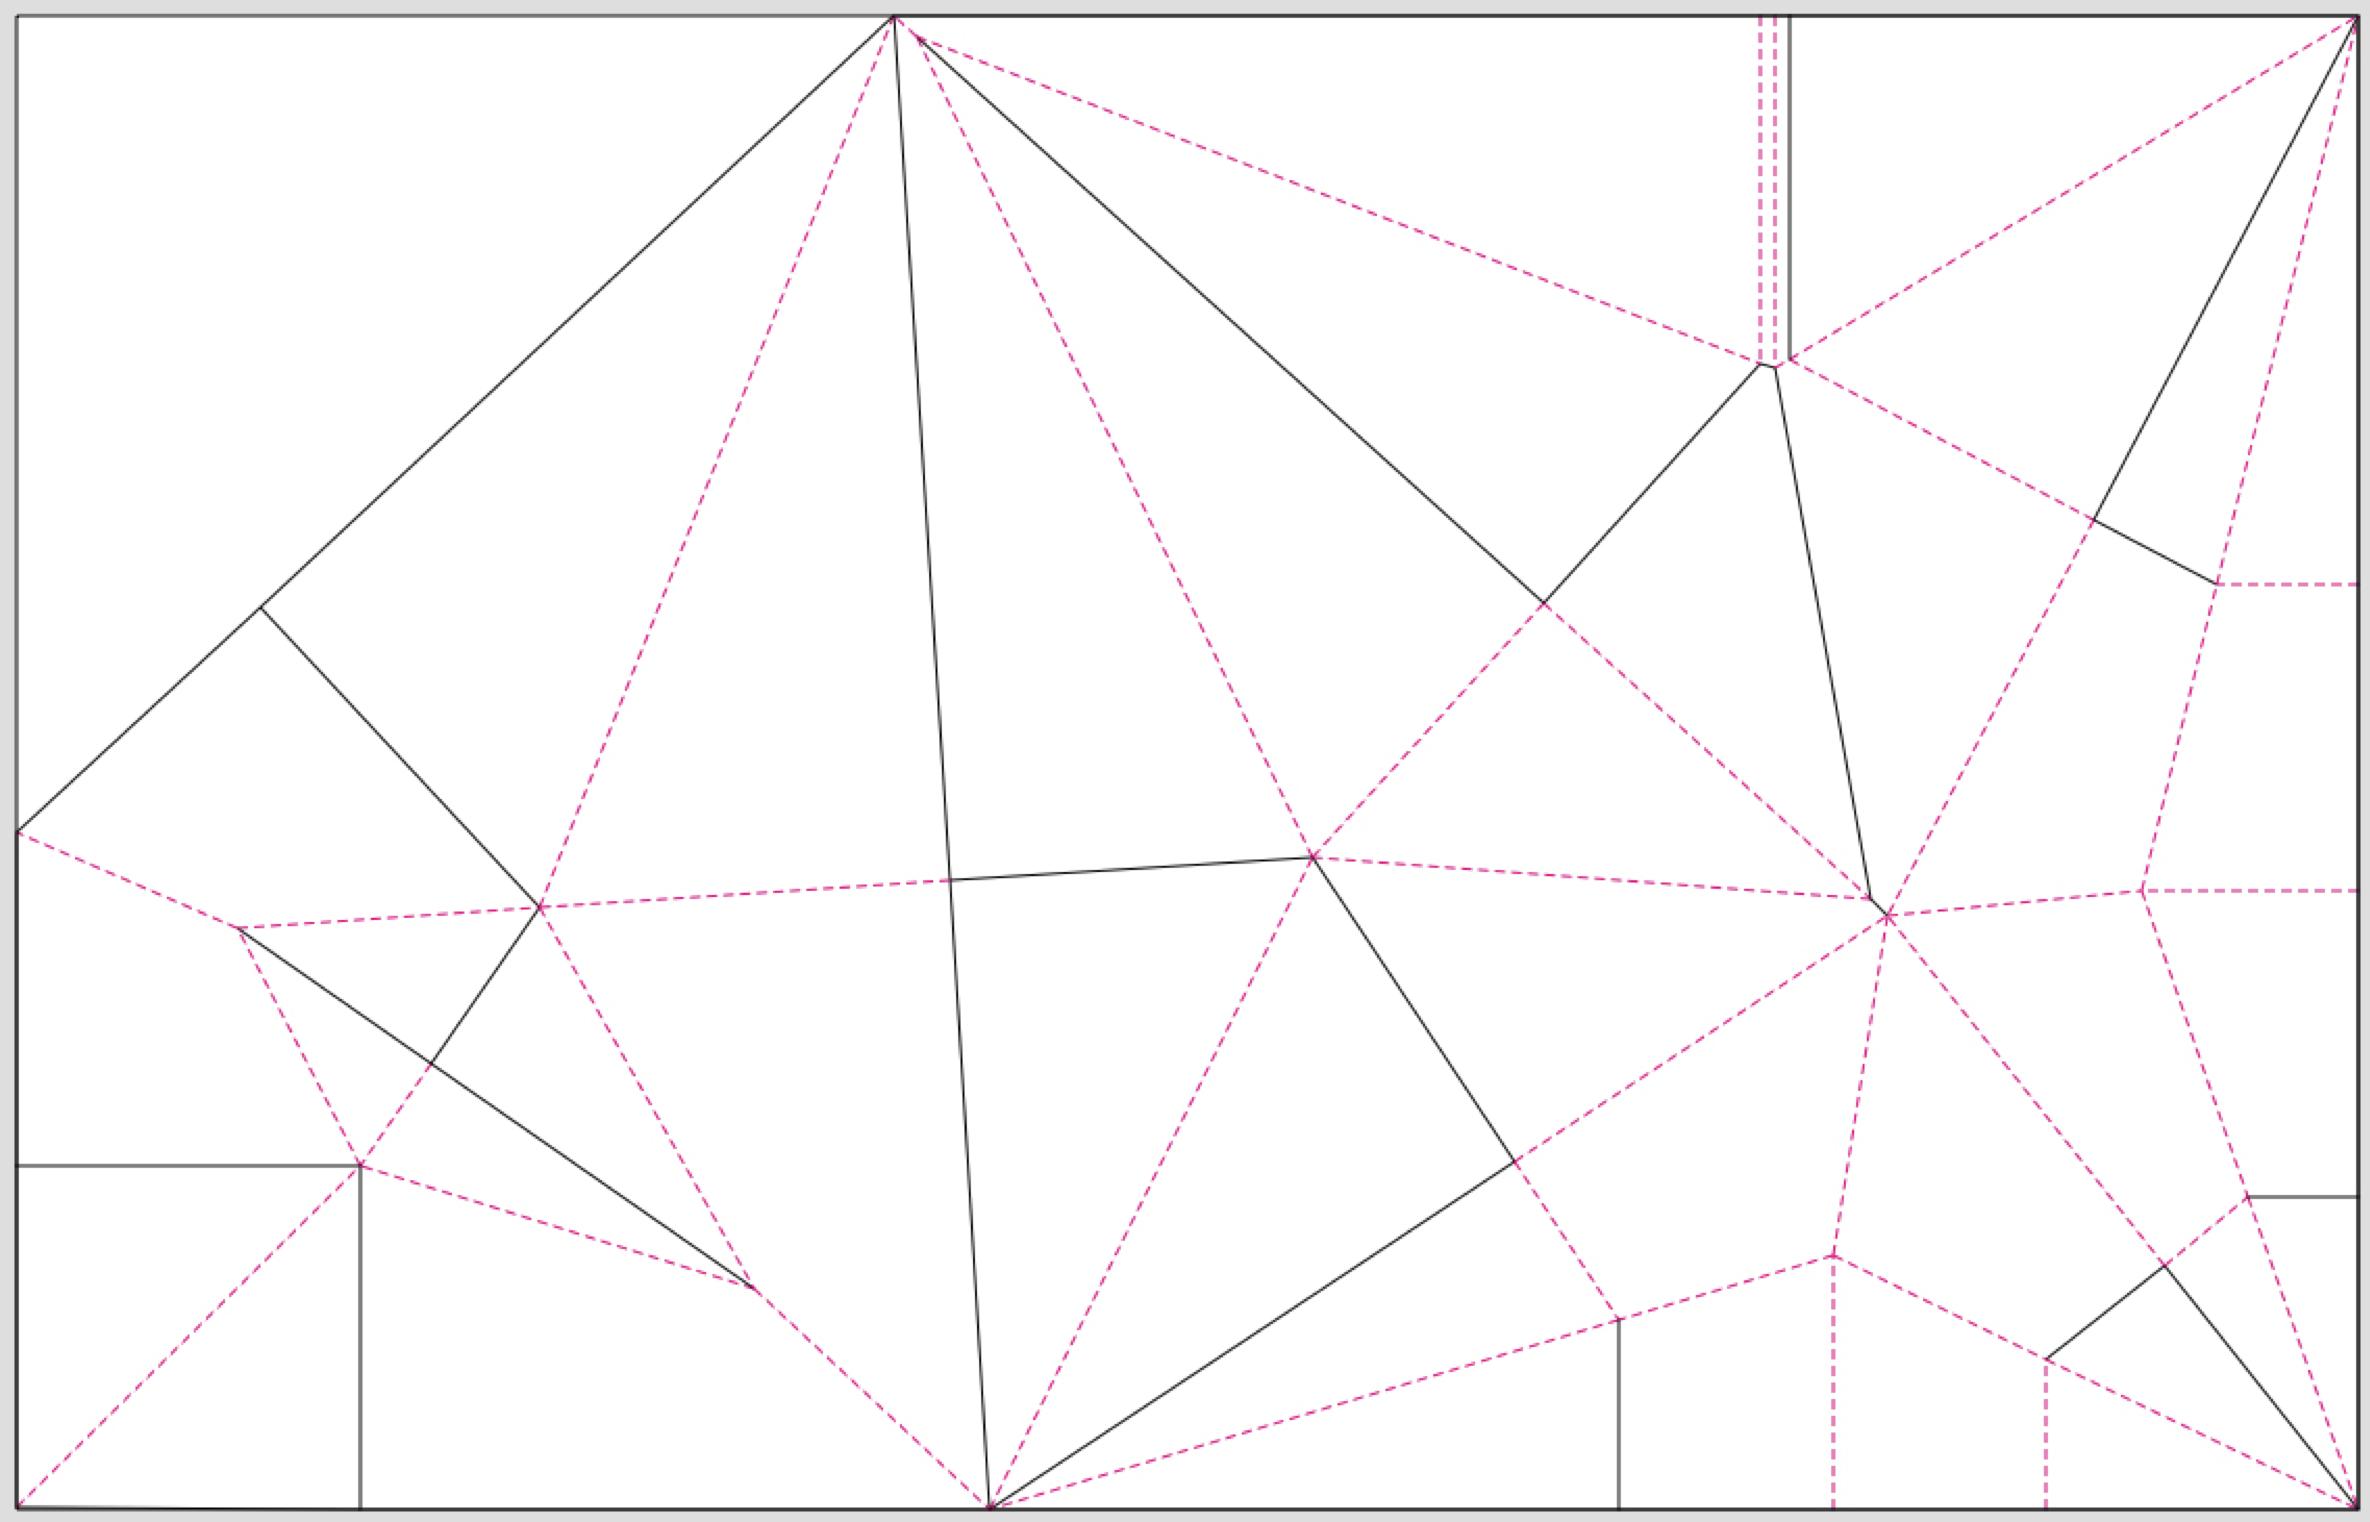 Refined origami folding plot of slogan data